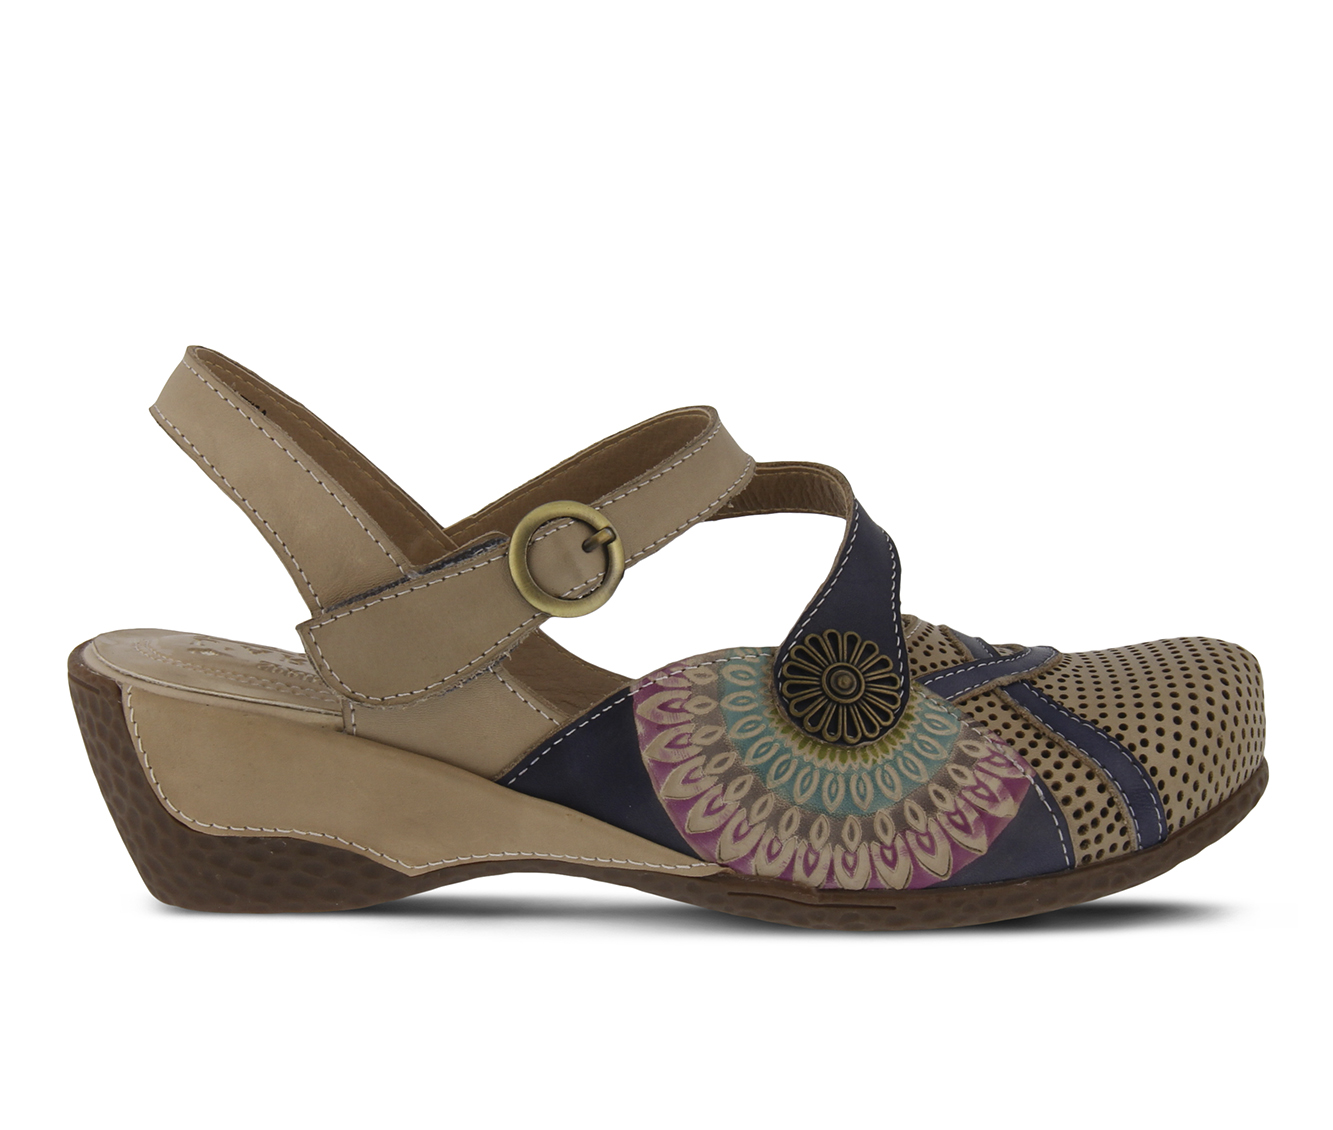 L'Artiste Parkway Women's Shoe (Brown Leather)